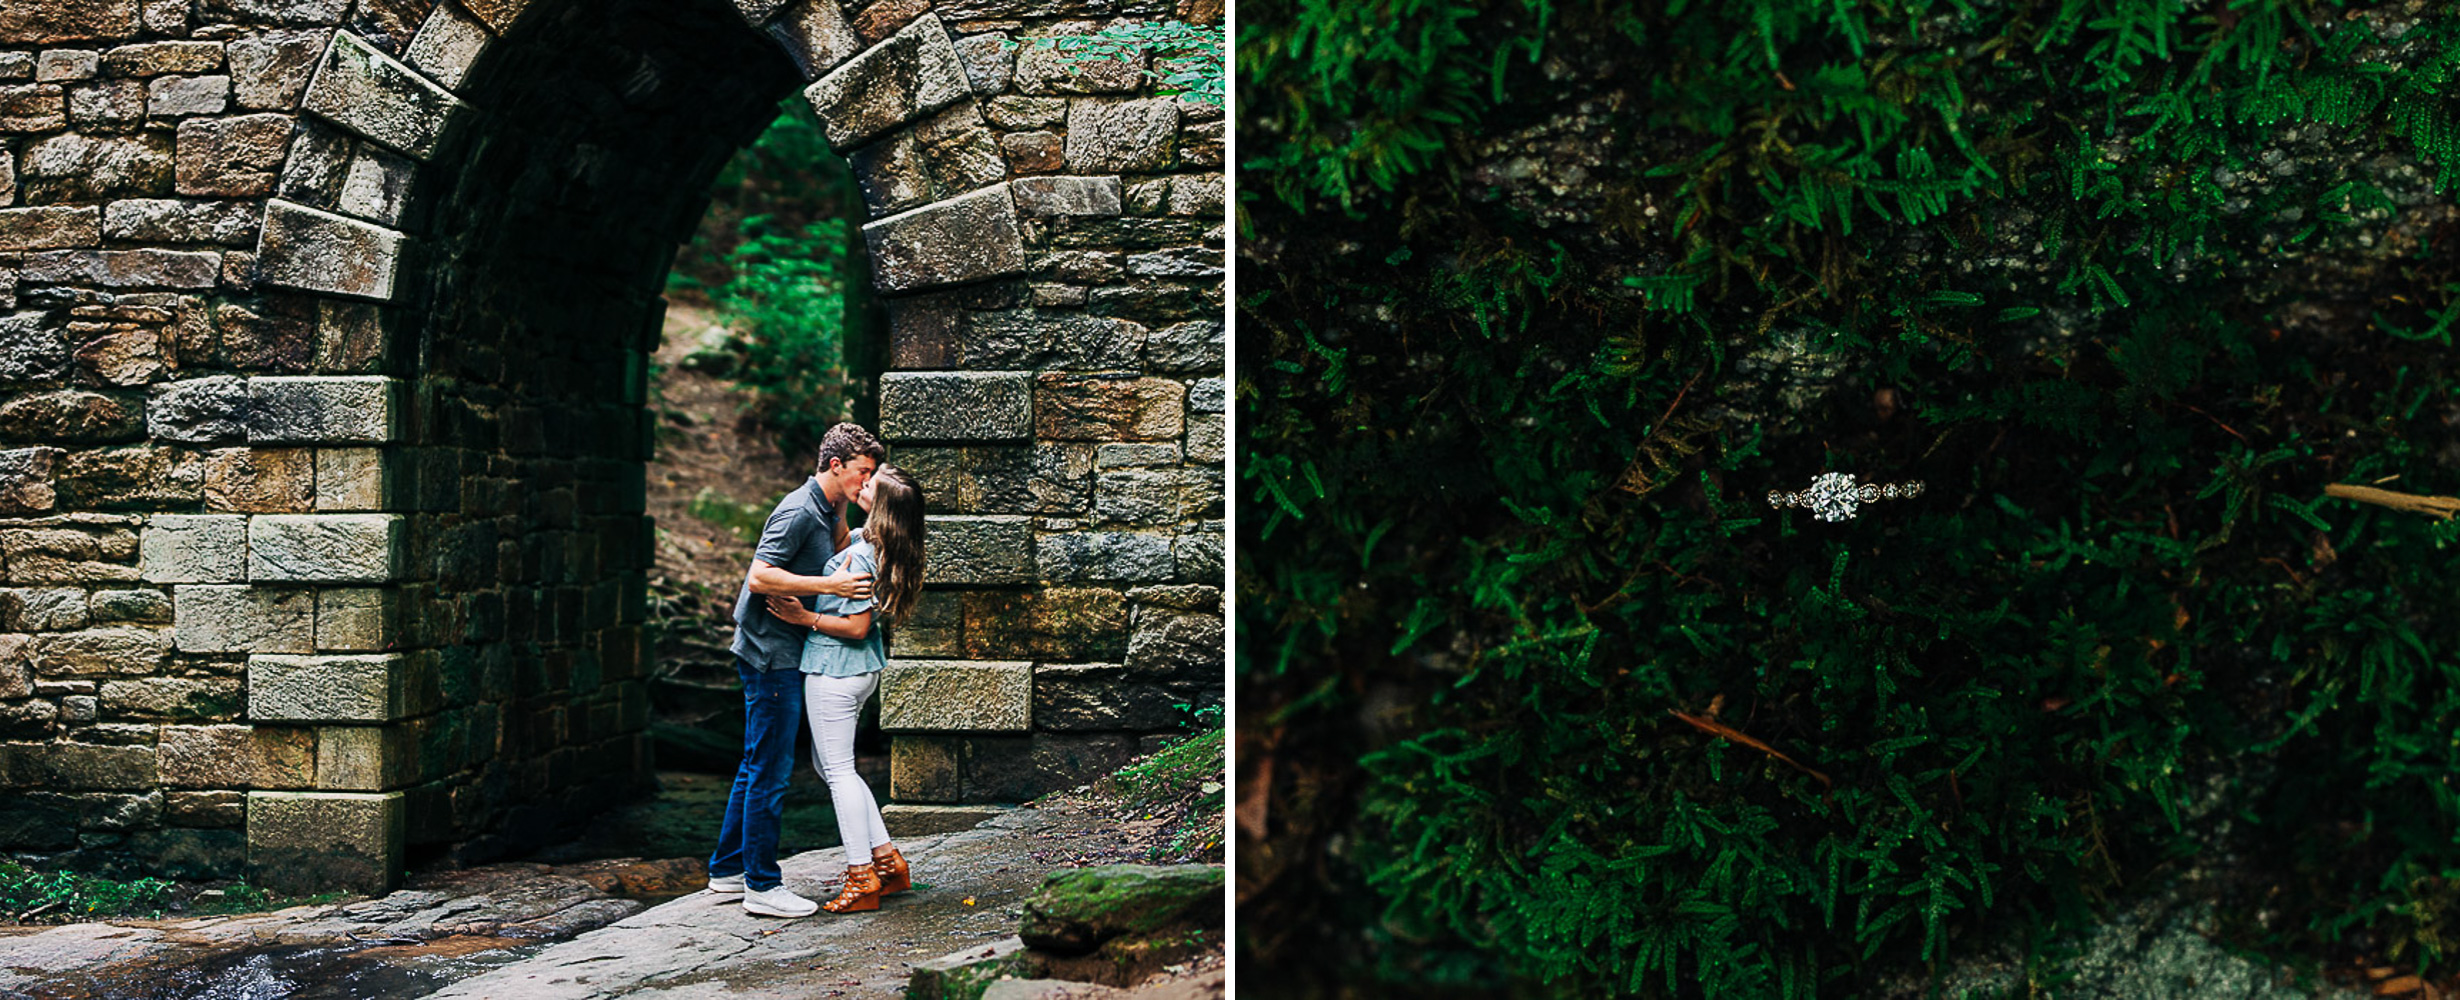 Engagement Portraits, Summer Engagement, Summer Mast Photography, 18.jpg